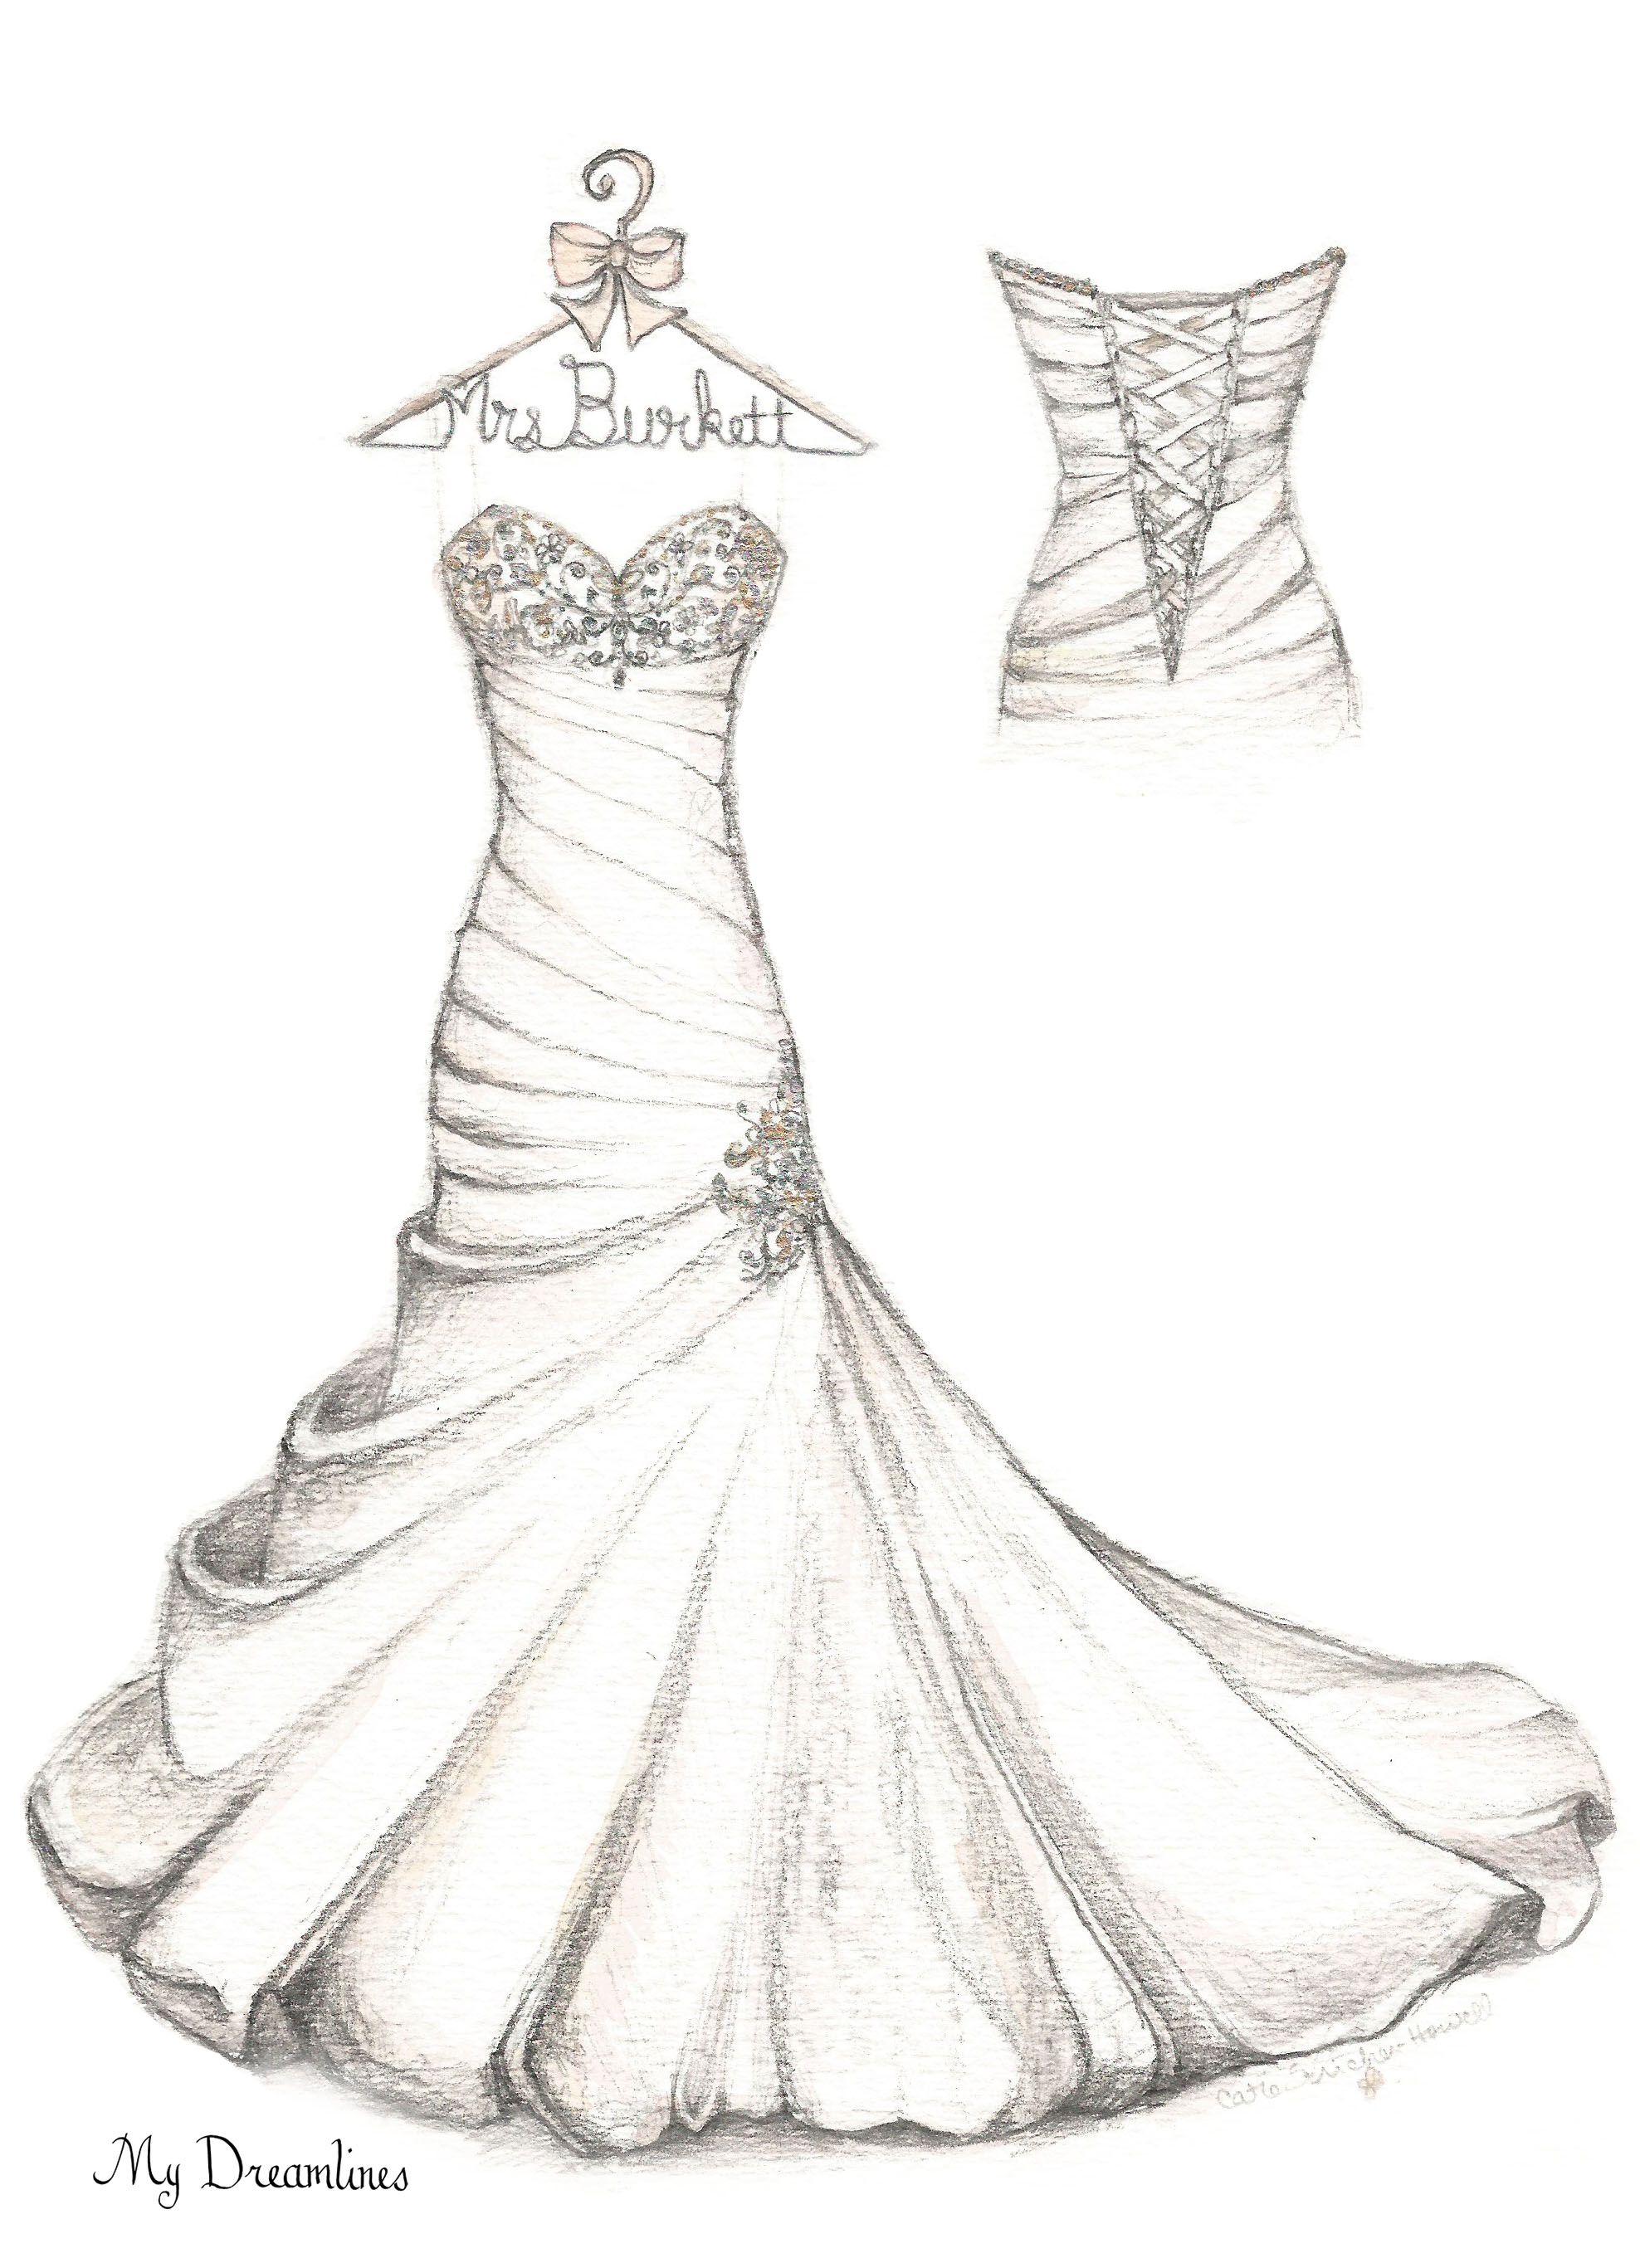 Pin by Wedding Dress Sketch - Dreamlines on A Wedding ...